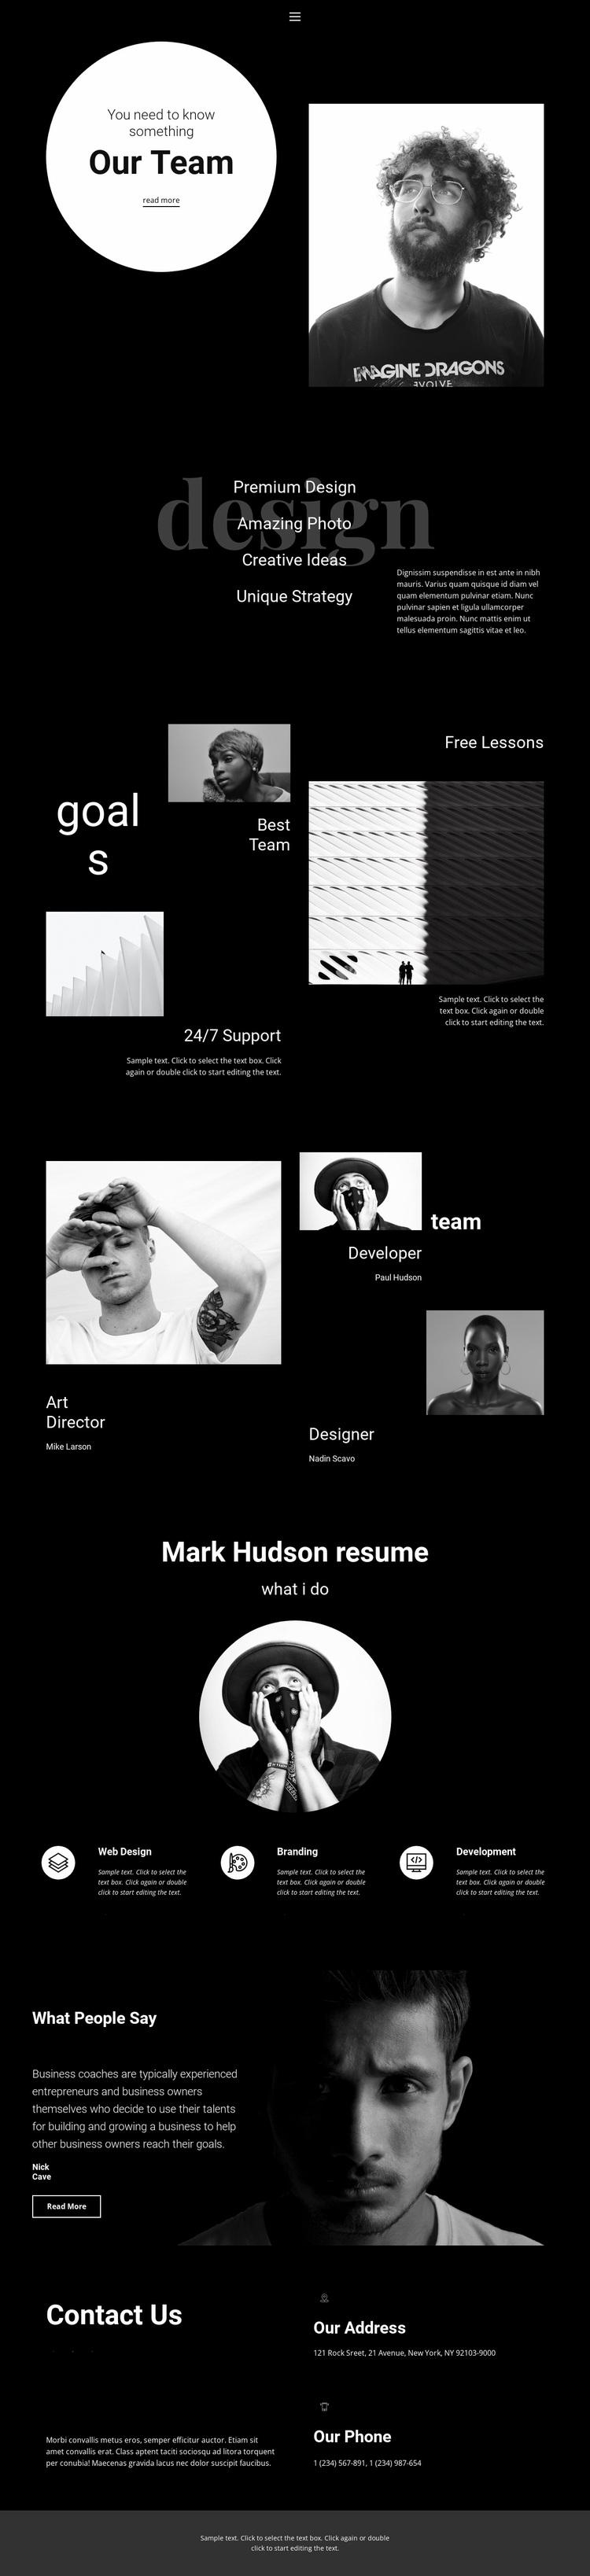 Design and development team Website Design